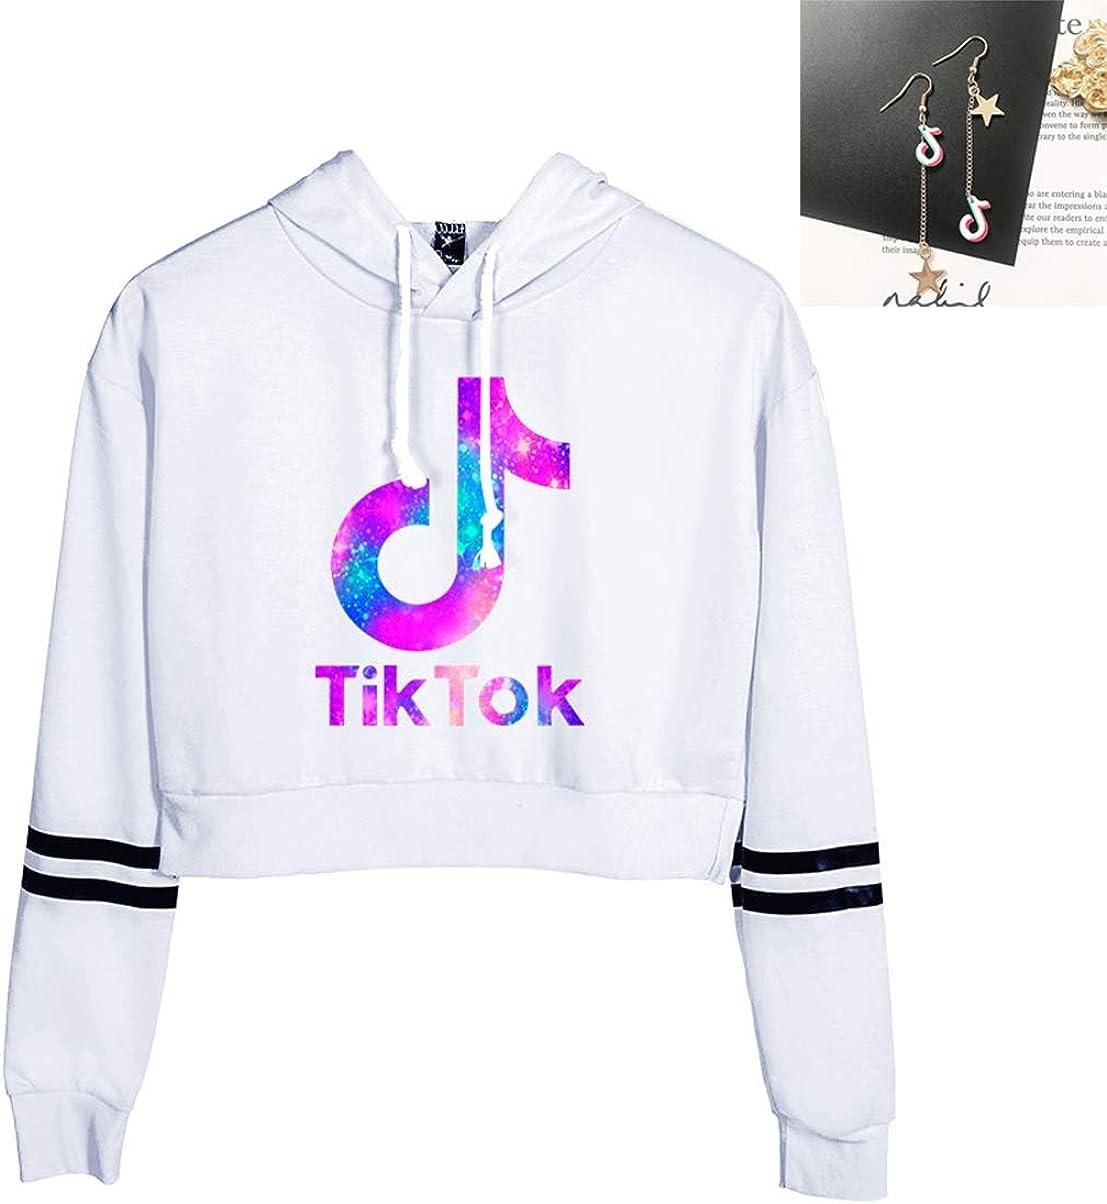 Womens Girls TIK TOK Top Hoodies Sweatshirt with 2 Piece Earrings Jewelry Pendant for Funs Black+Earring, X-Small